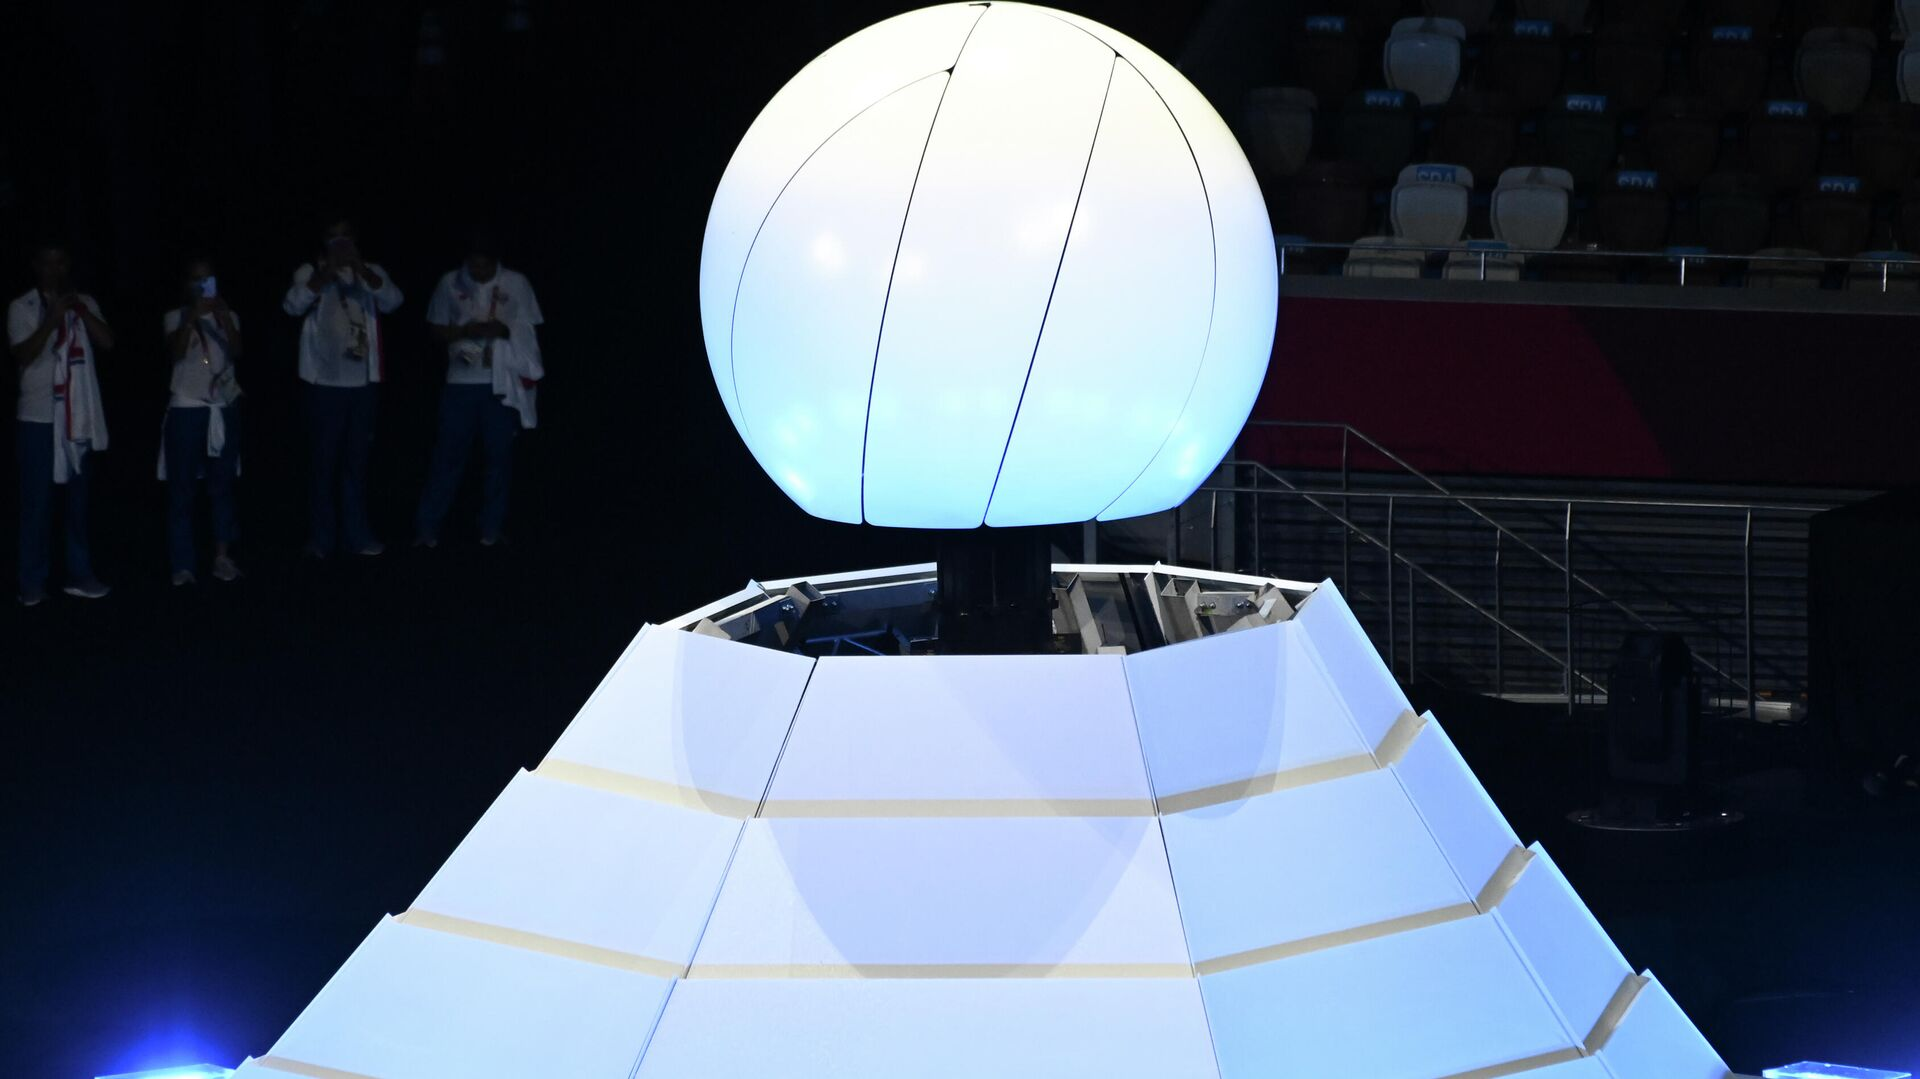 Церемония закрытия XXXII летних Олимпийских игр в Токио - Sputnik Латвия, 1920, 08.08.2021